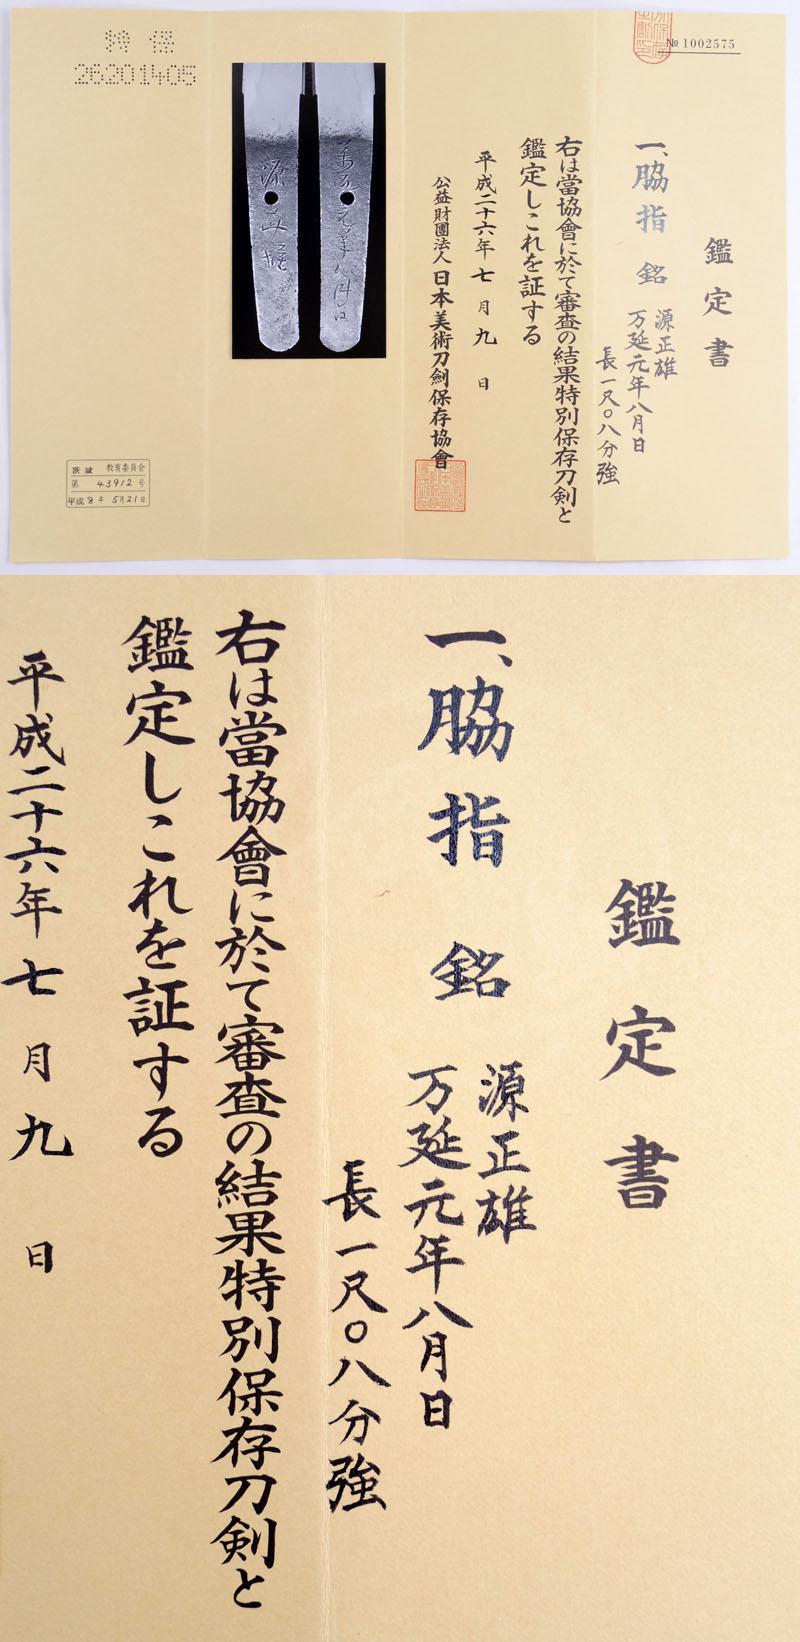 源正雄 (鈴木次郎)  Picture of Certificate